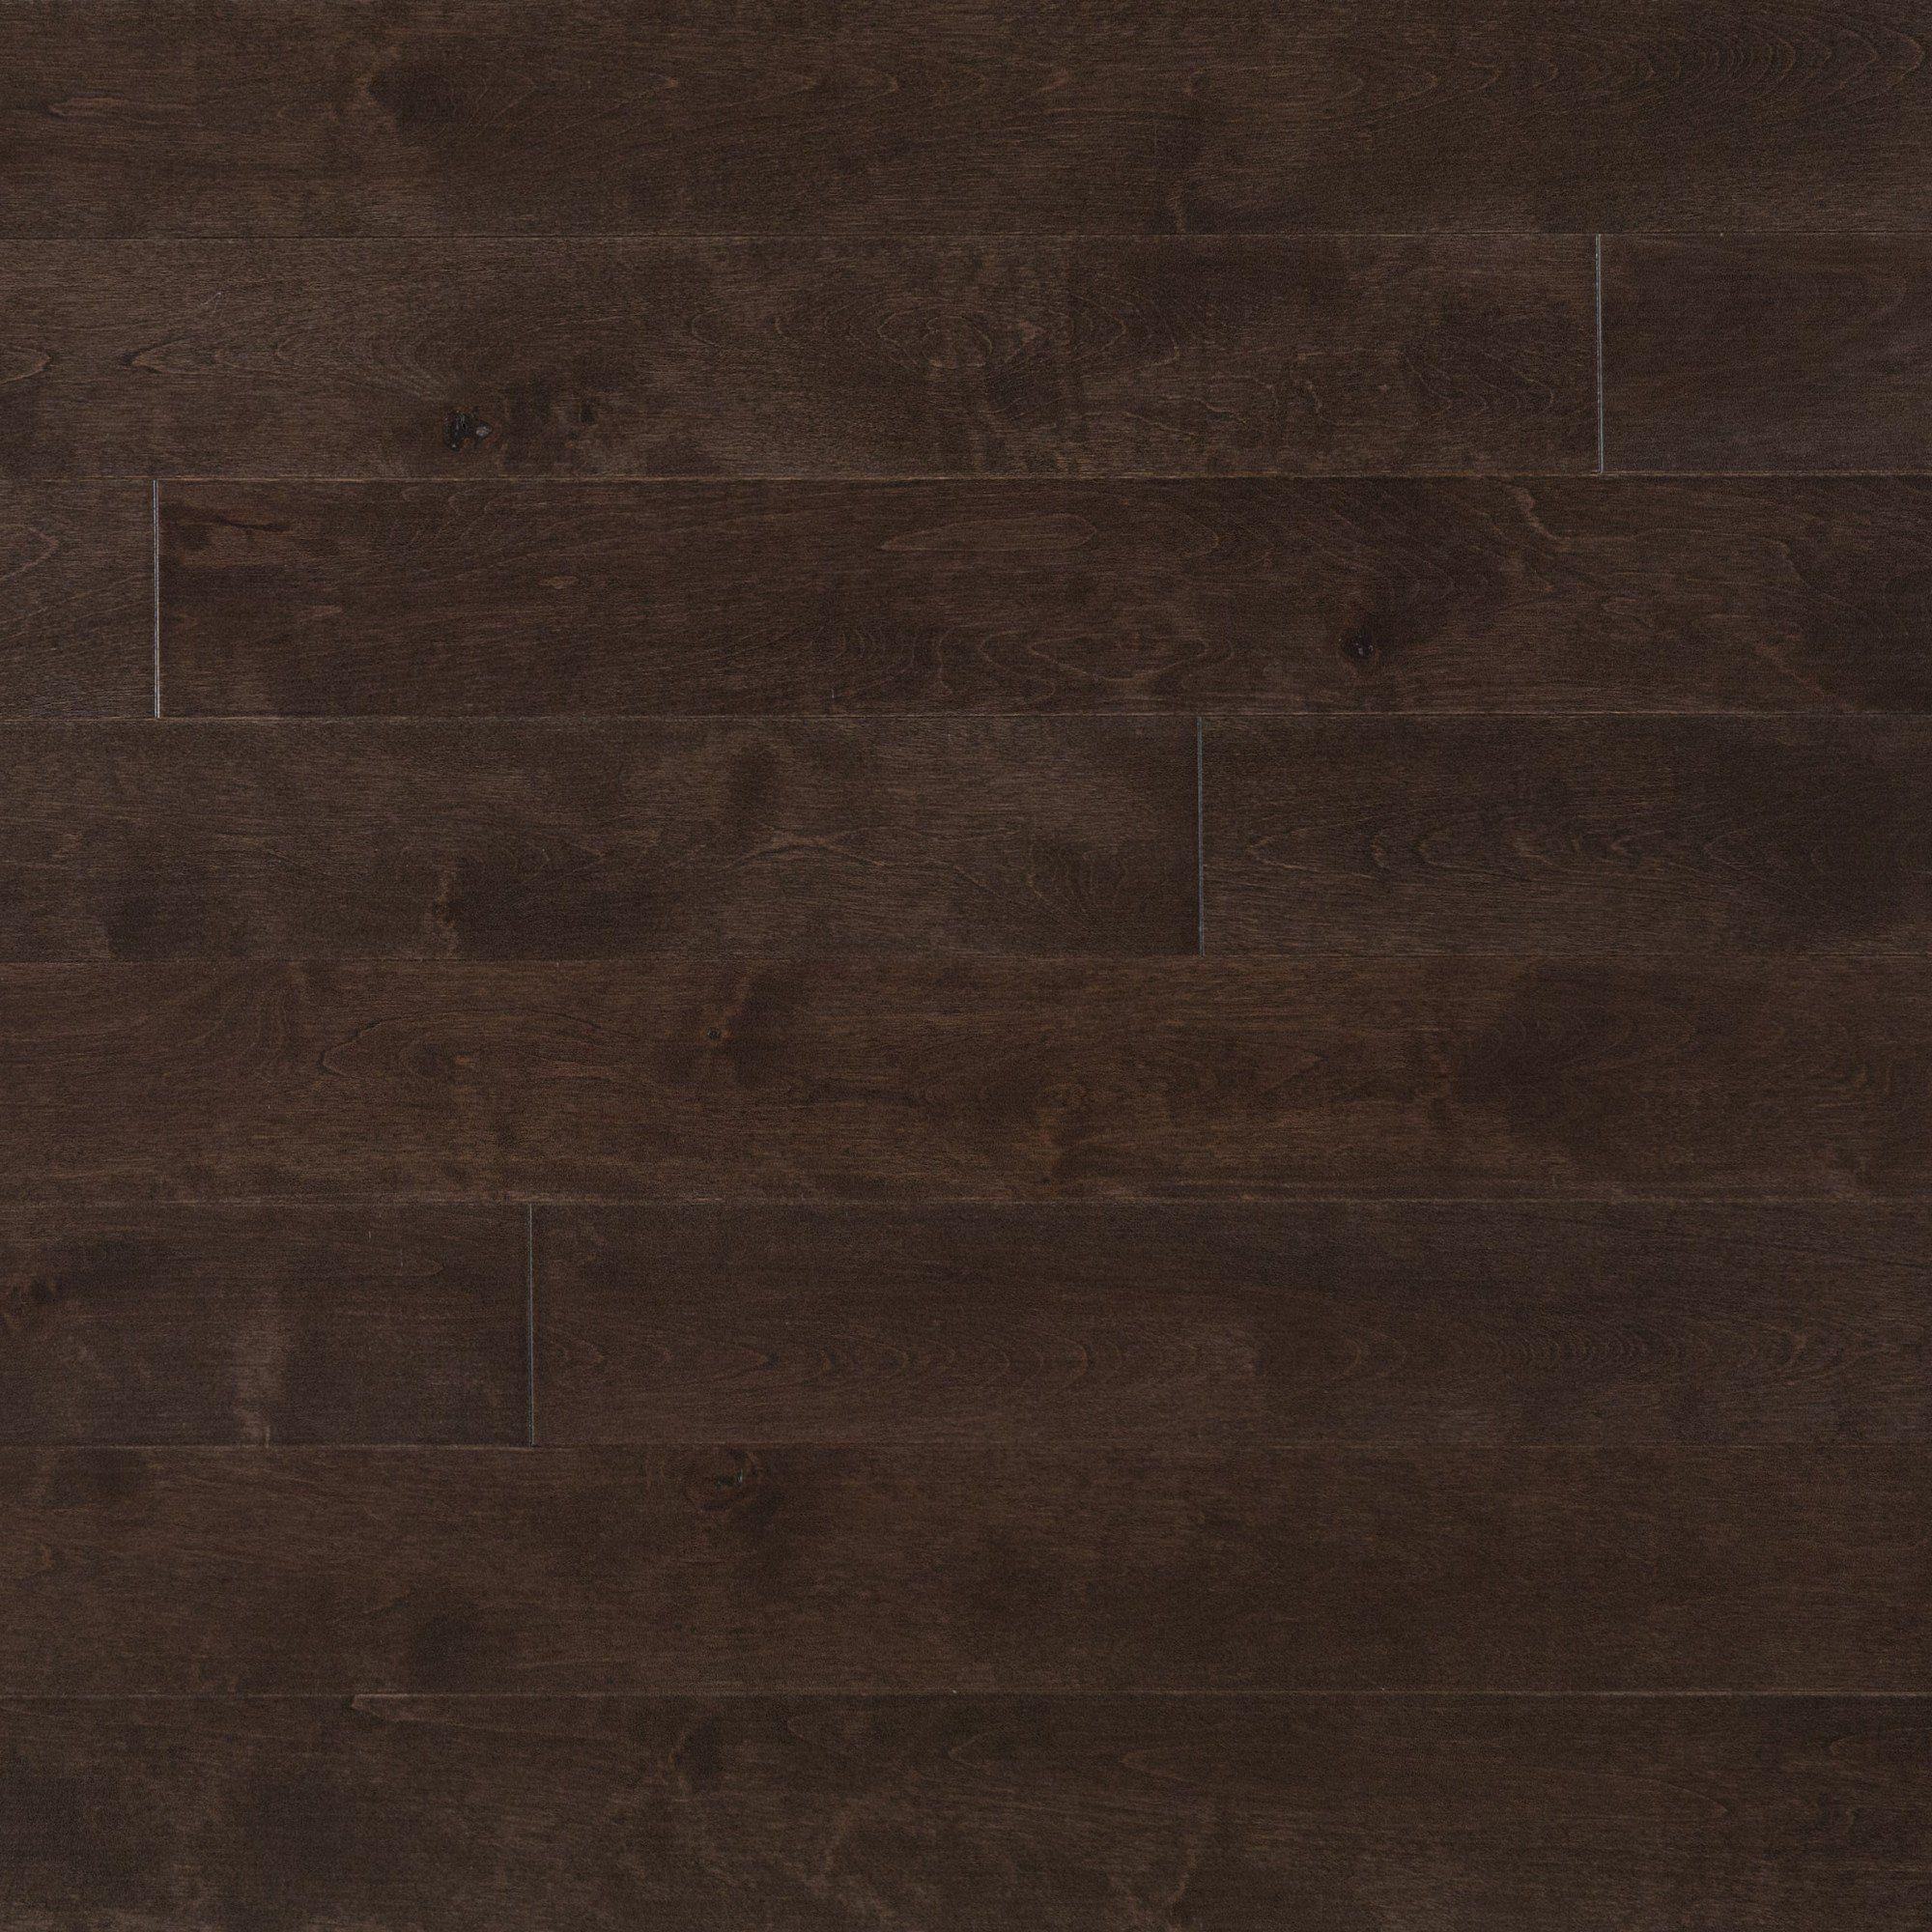 Mirage Hardwood Floors Aged Maple Black Jelly Bean Black Jelly Beans Flooring Jelly Beans